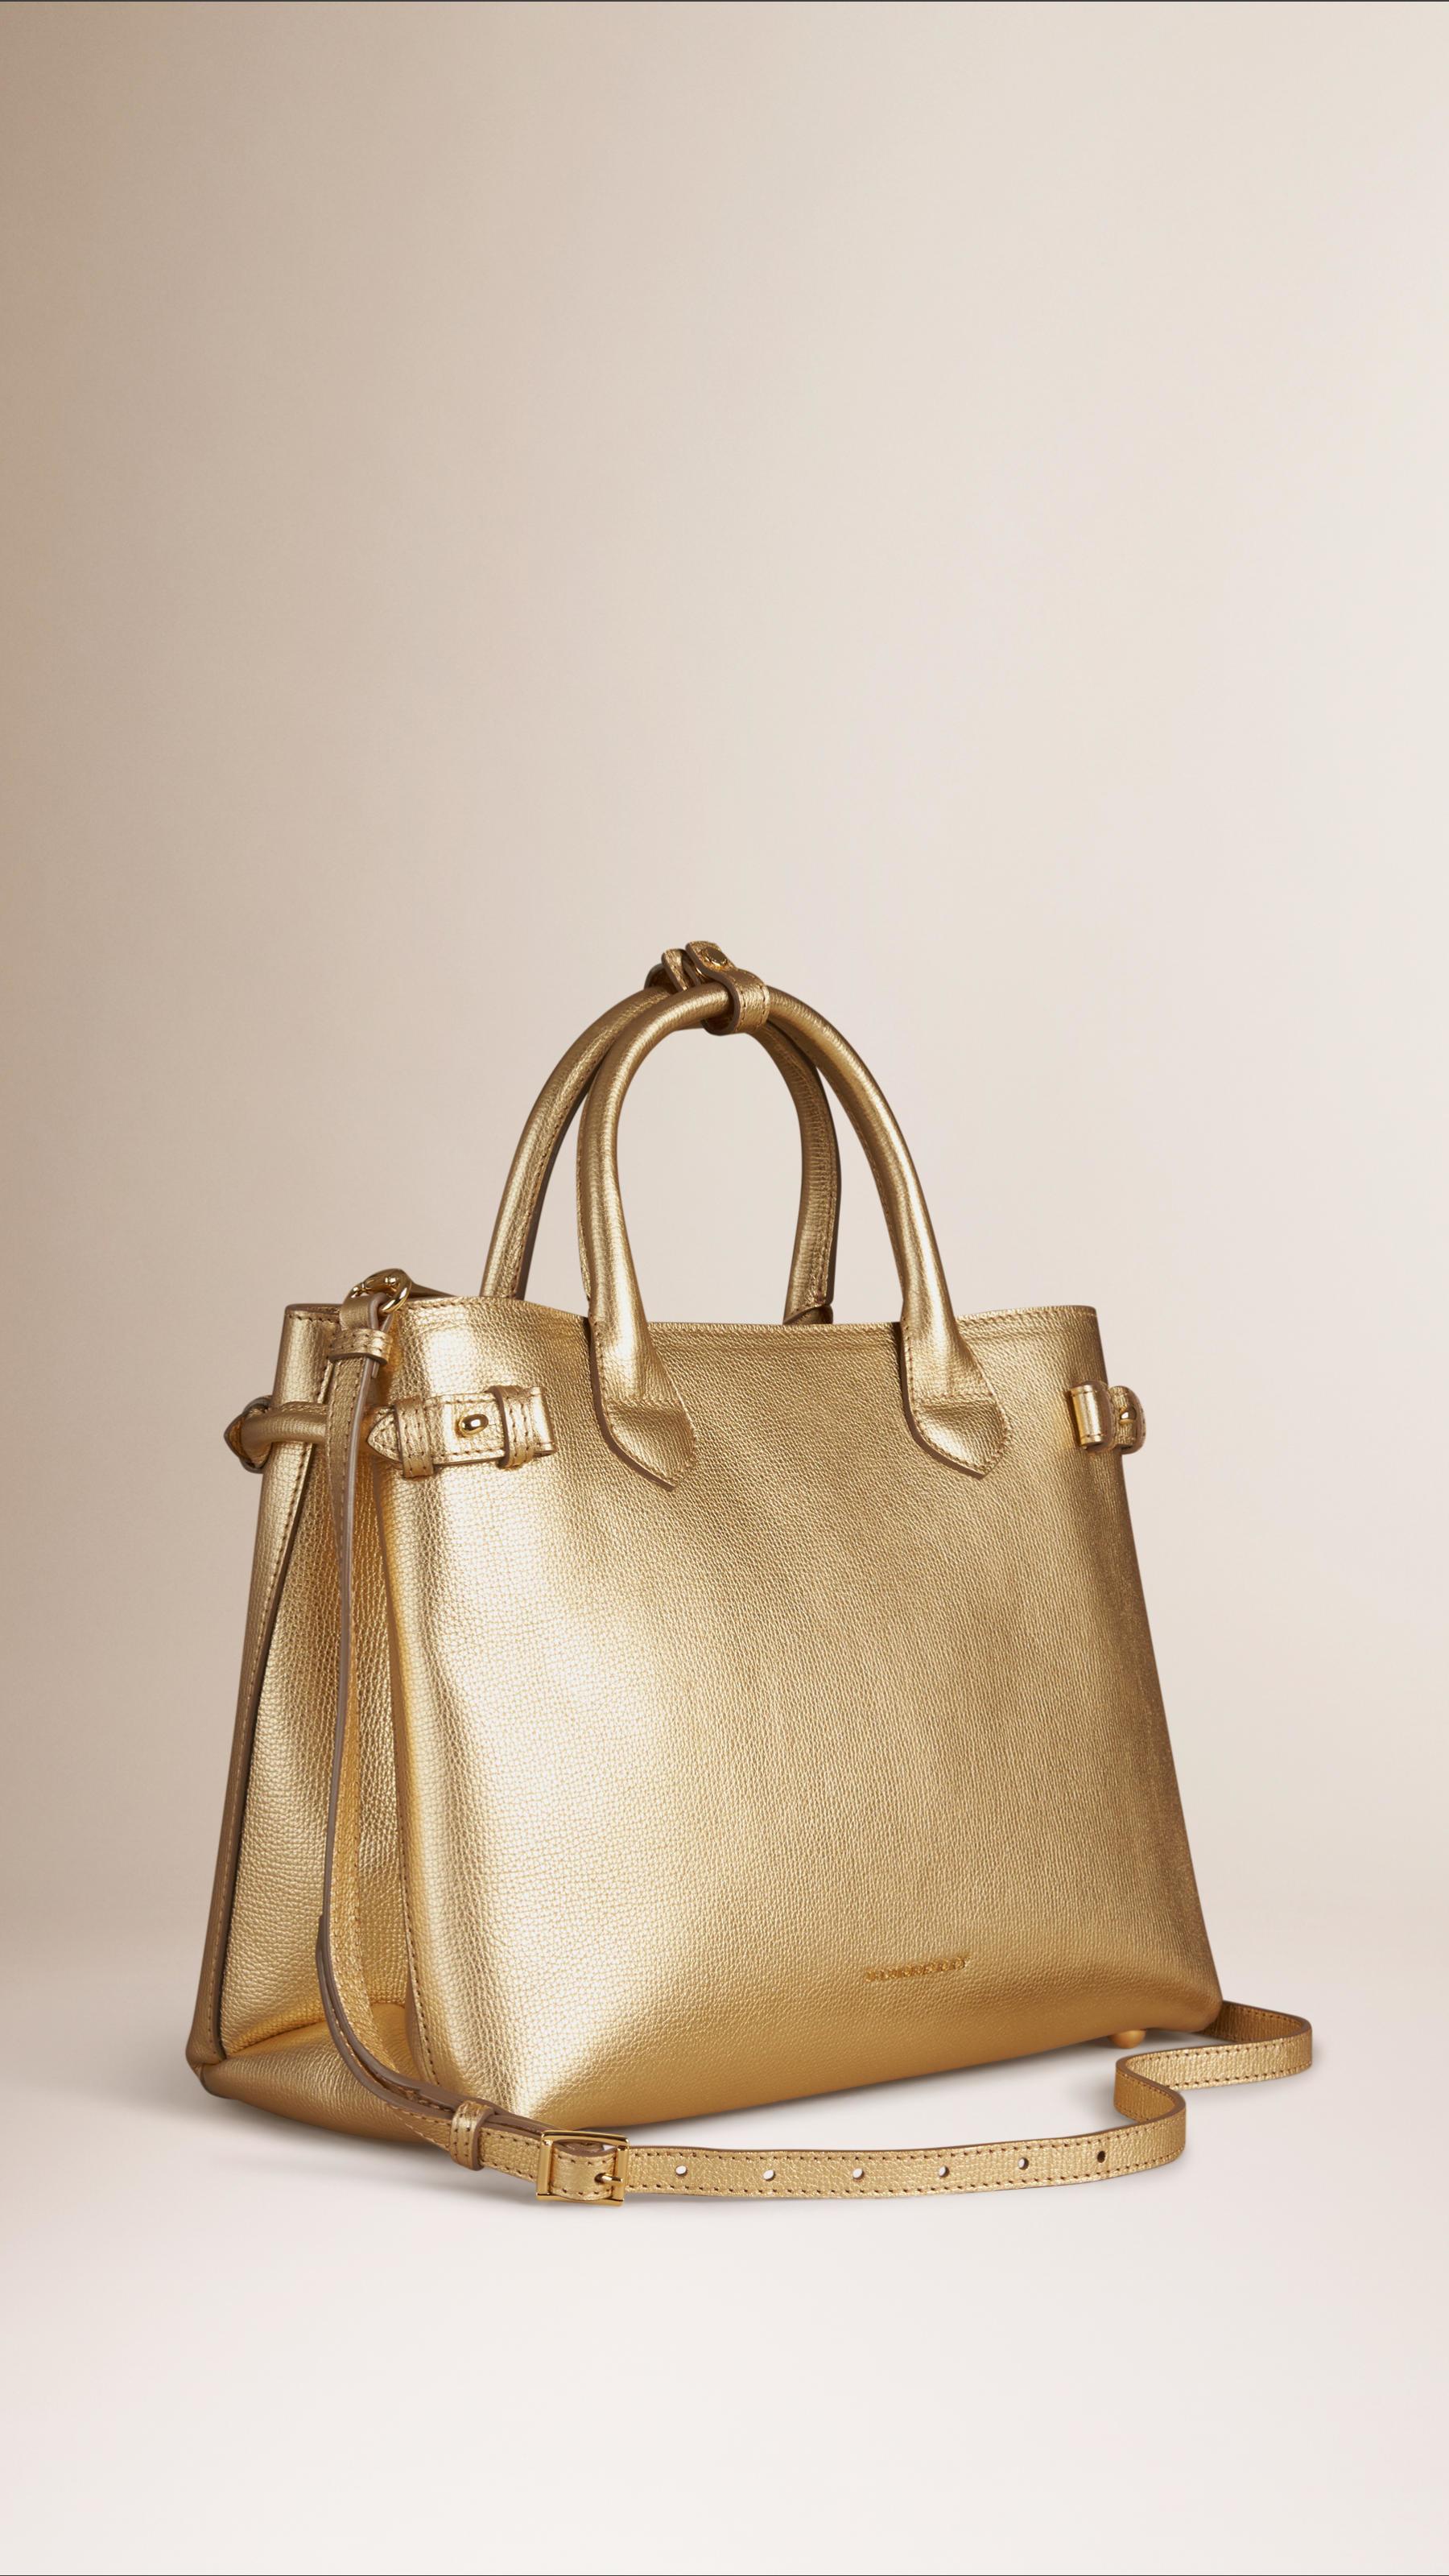 c577c9d757f6 Lyst - Burberry The Banner Medium Leather Bag in Metallic